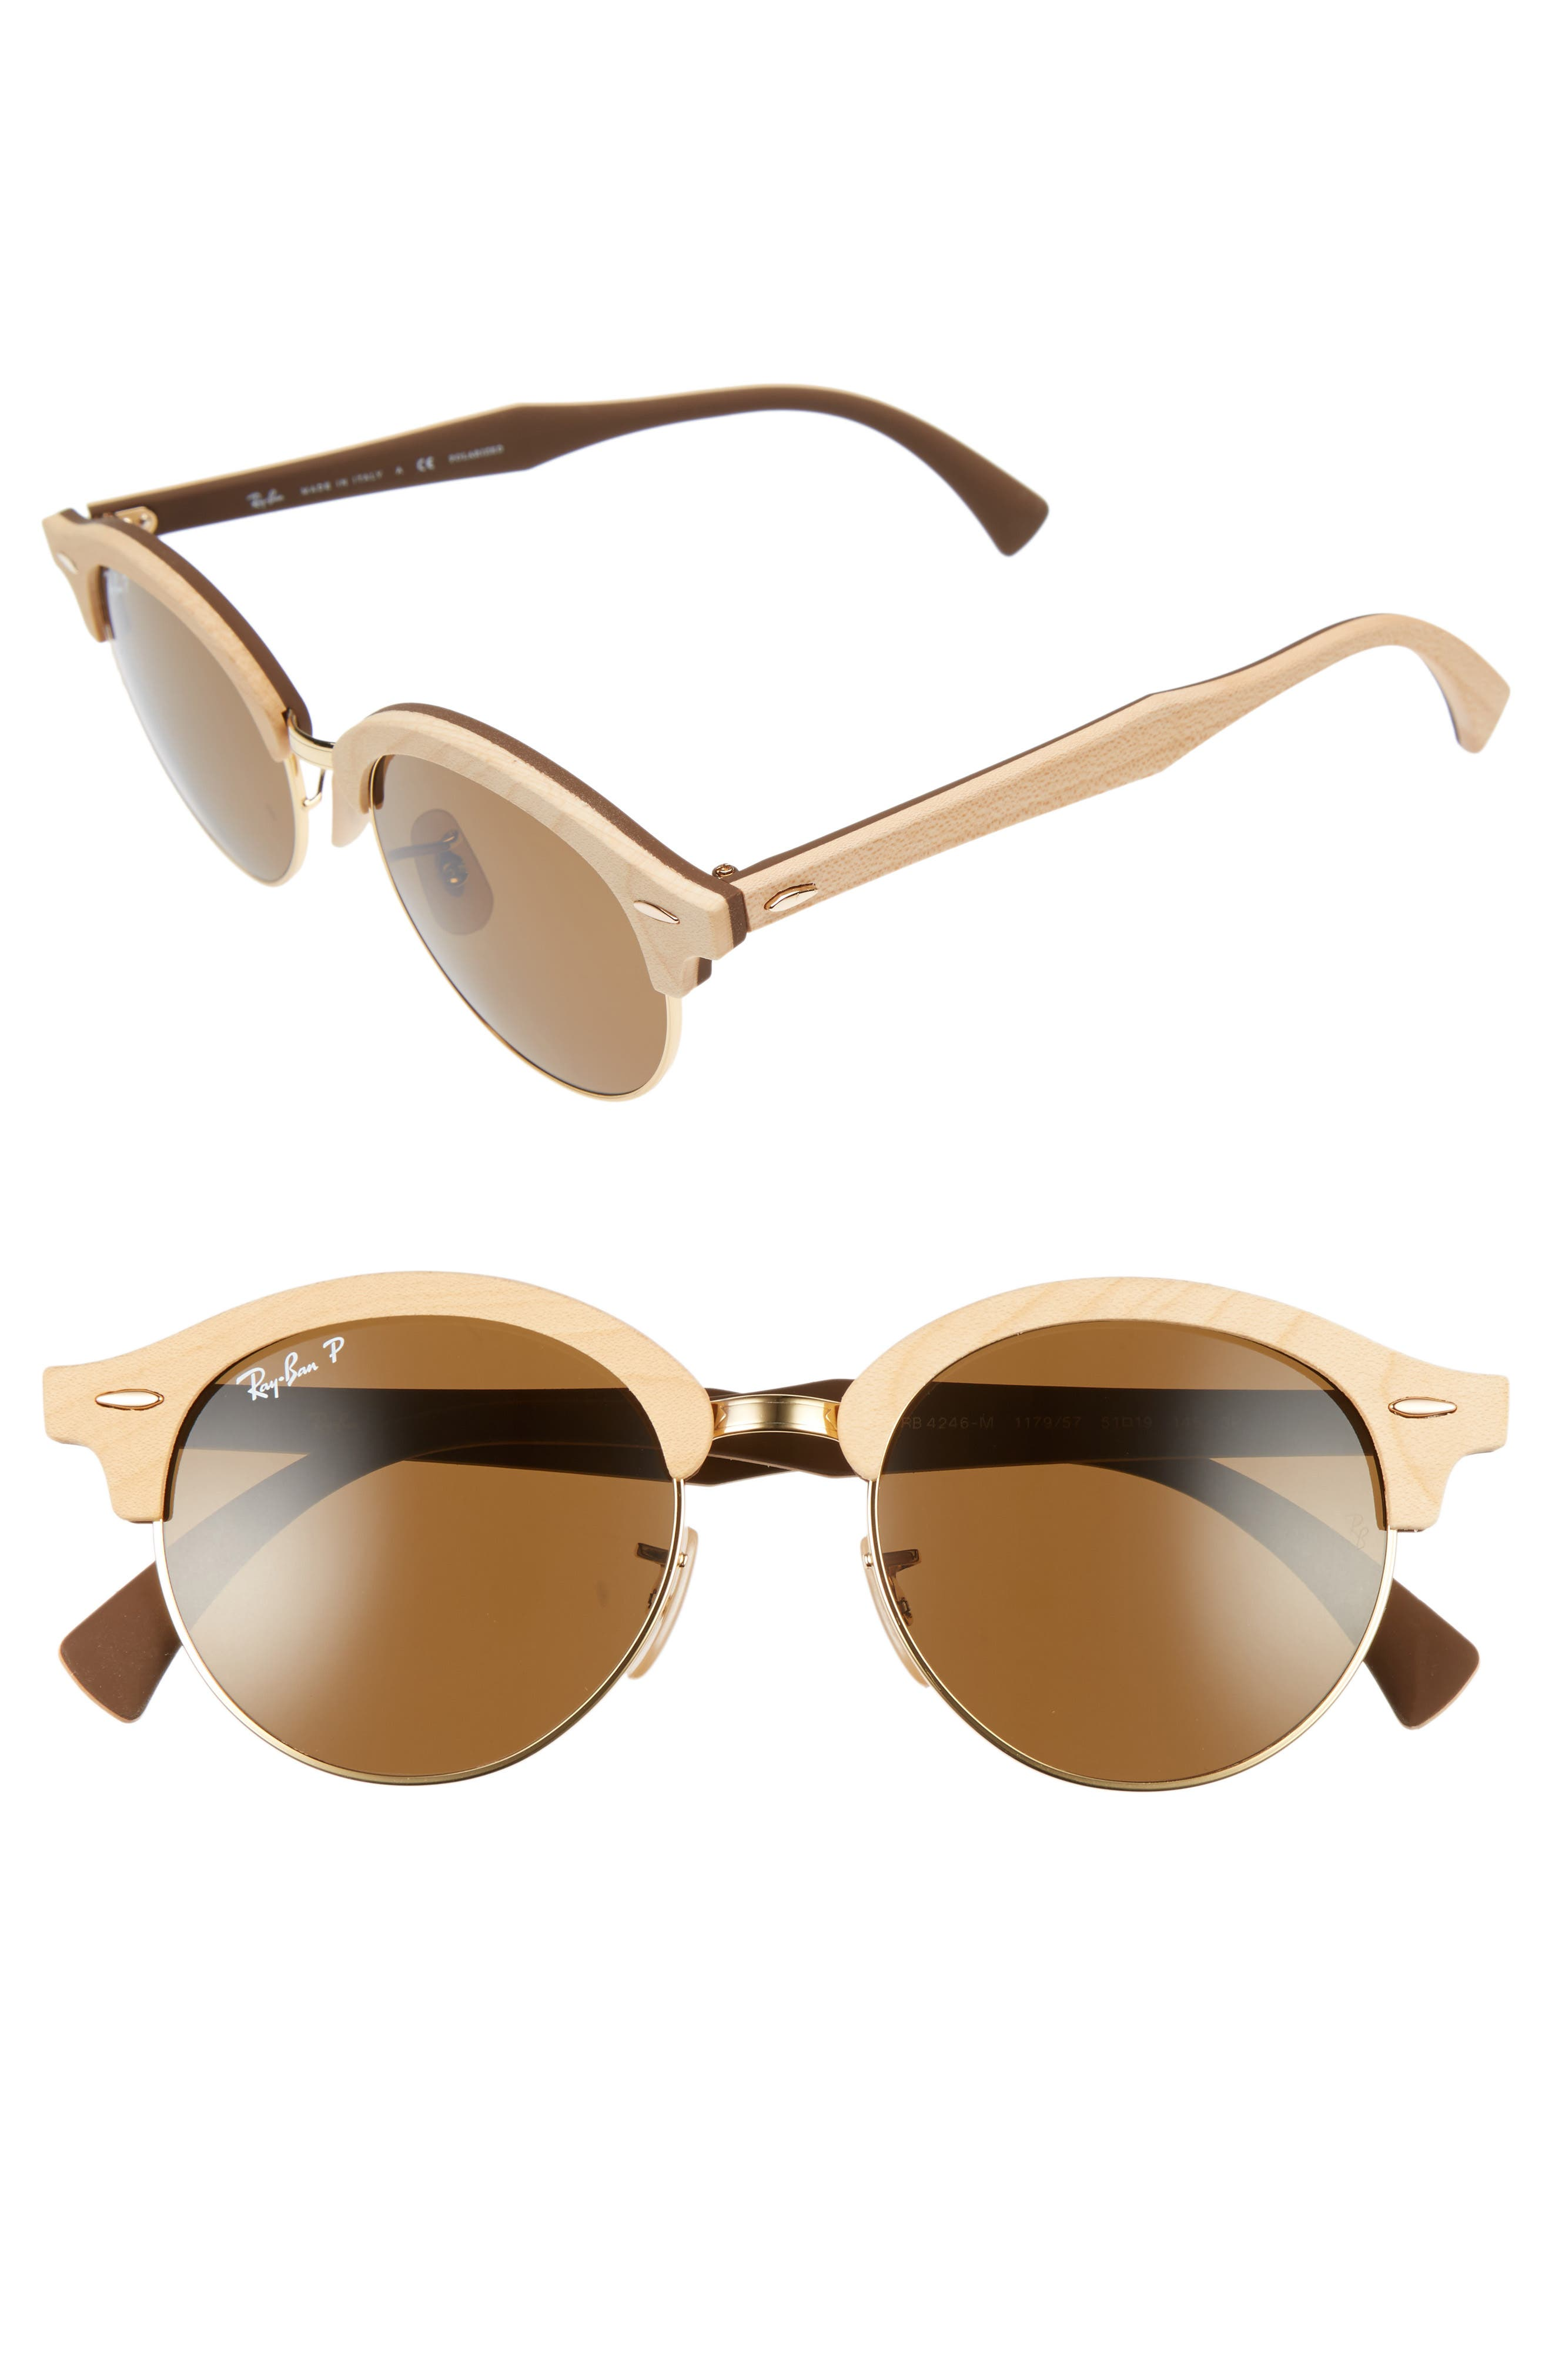 Main Image - Ray-Ban 51mm Polarized Round Sunglasses